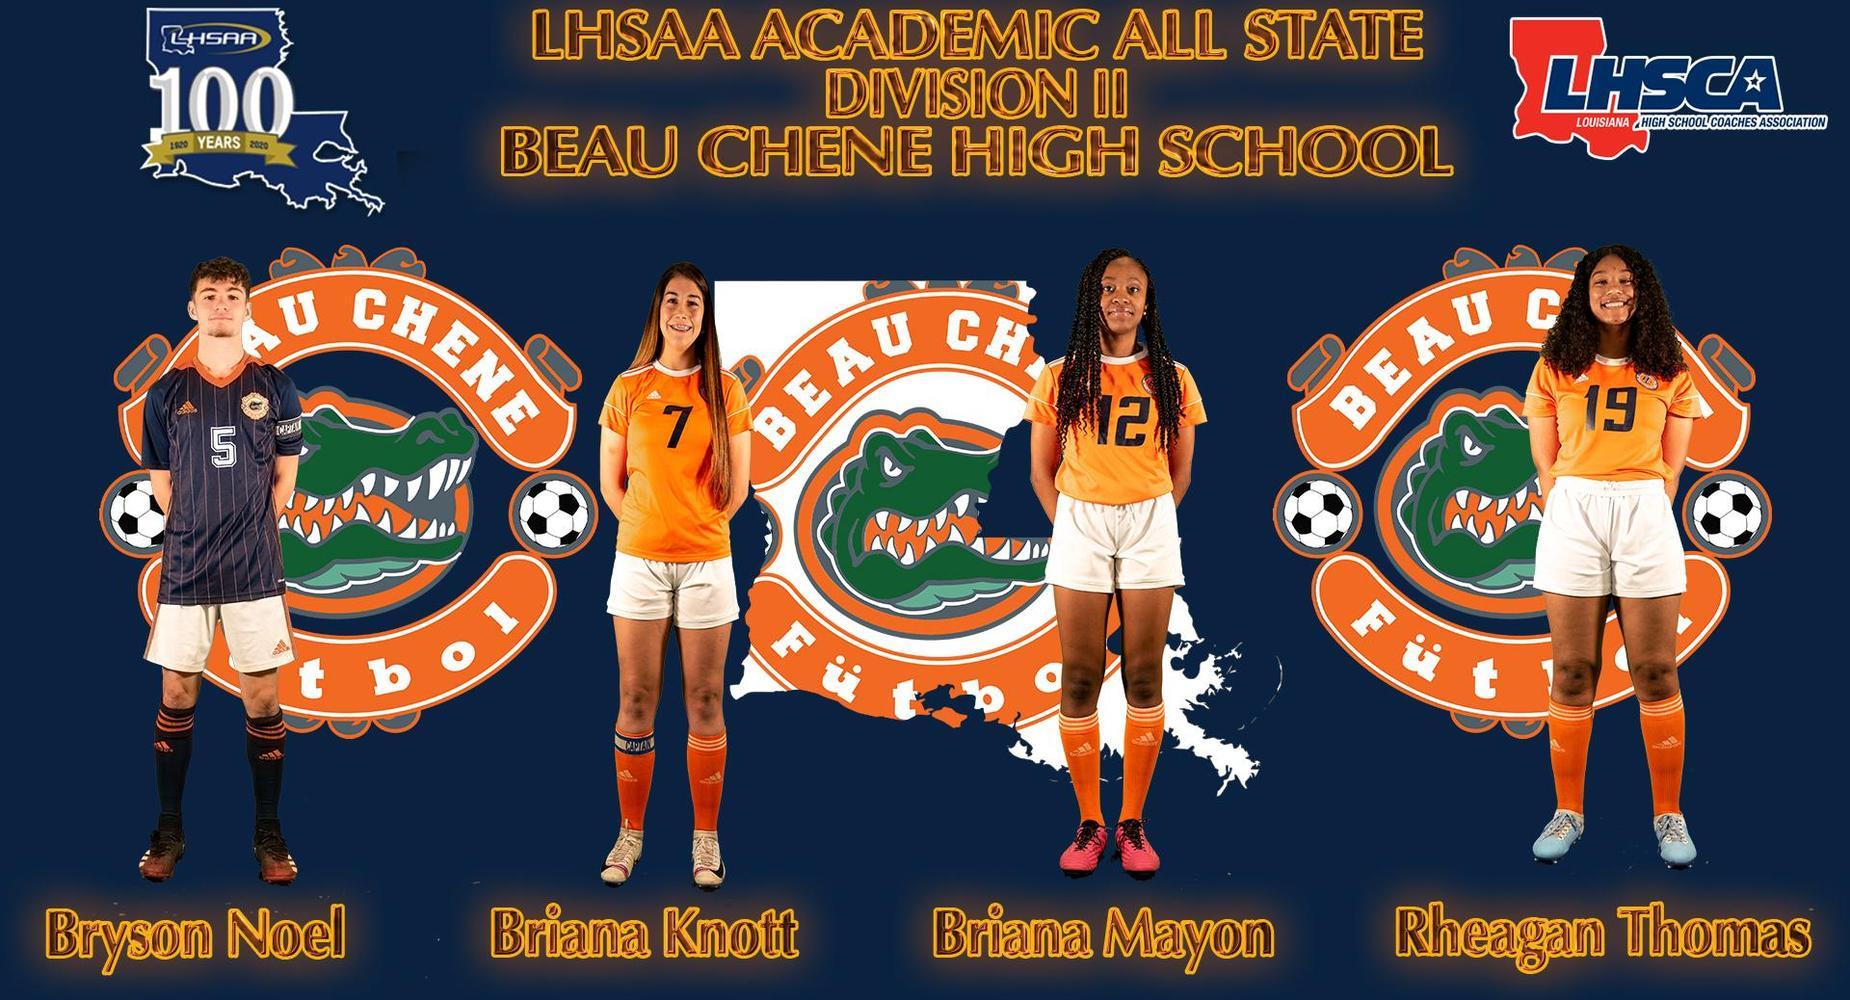 LHSAA Academic All State Division II - Bryson Noel, Brianna Knott, Briana Mayon & Rheagan Thomas